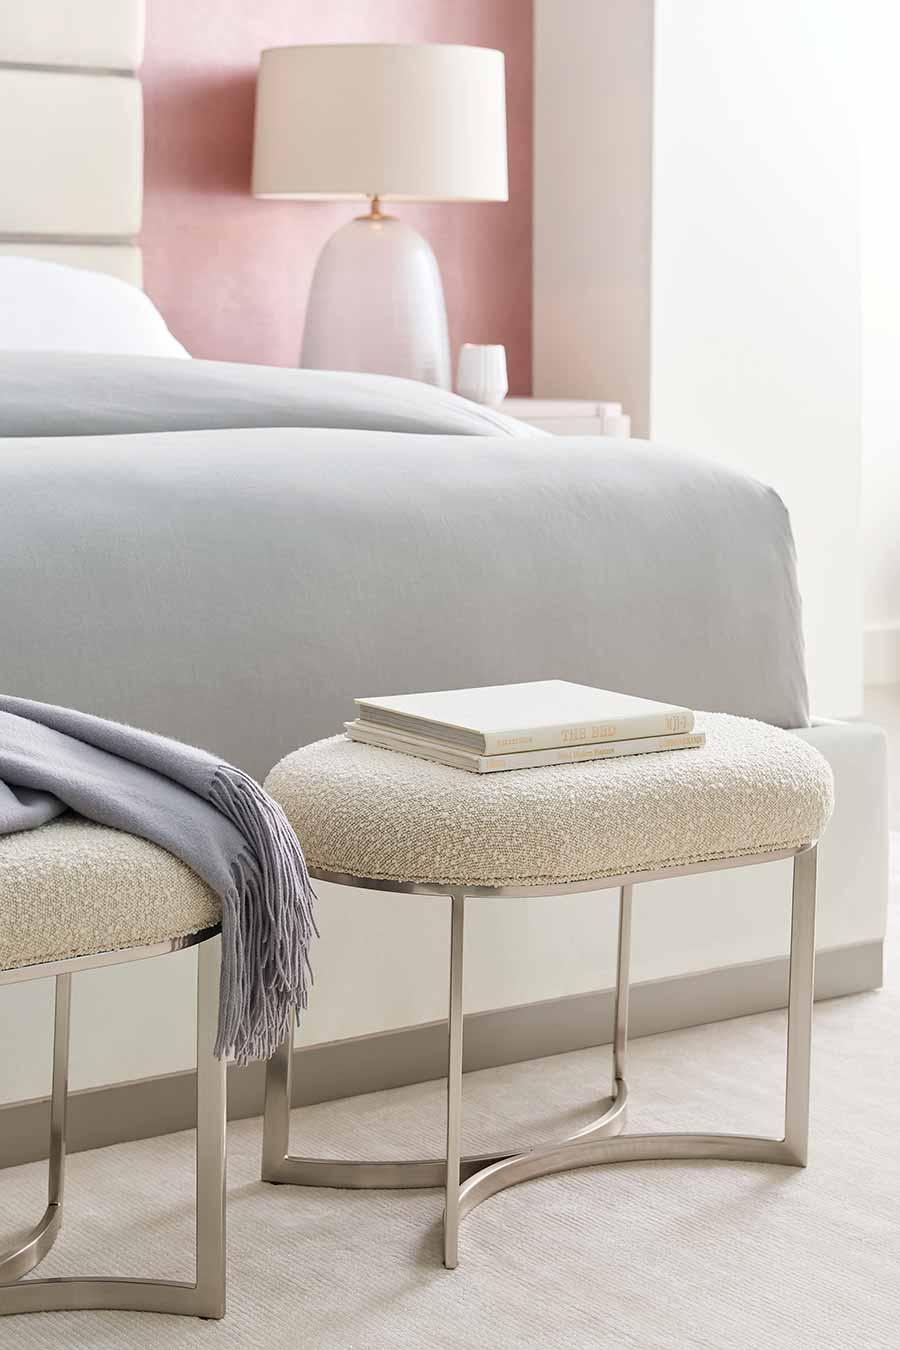 Bedroom Stool | Contemporary Luxury Designer Modern Exclusive Handcrafted Furniture | Sandton Johannesburg